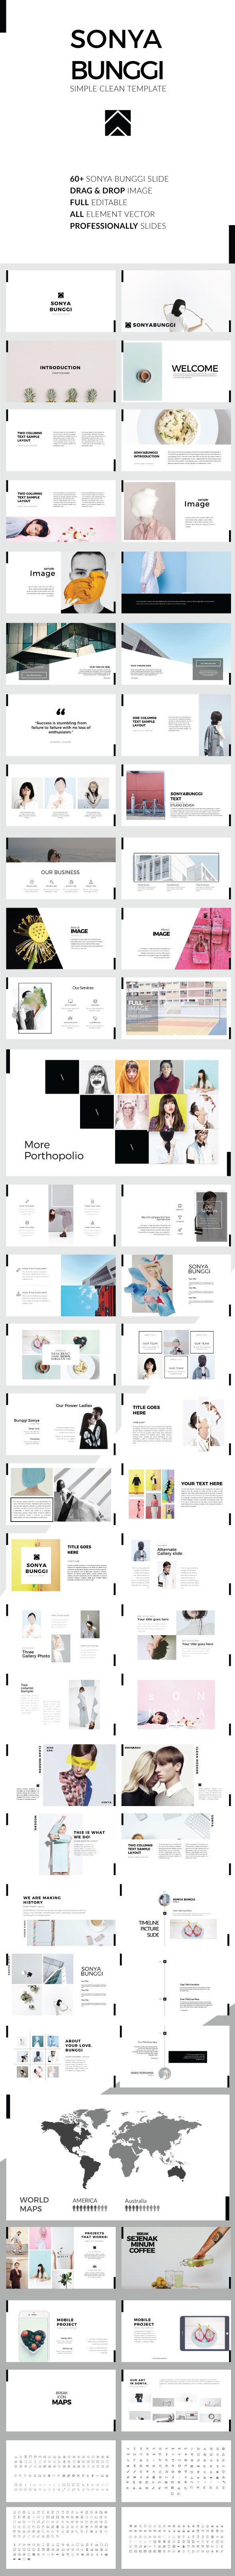 Sonya Bunggi - Simple Clean Keynote Template - #Business #Keynote #Templates Download here: https://graphicriver.net/item/sonya-bunggi-simple-clean-keynote-template/19531439?ref=alena994